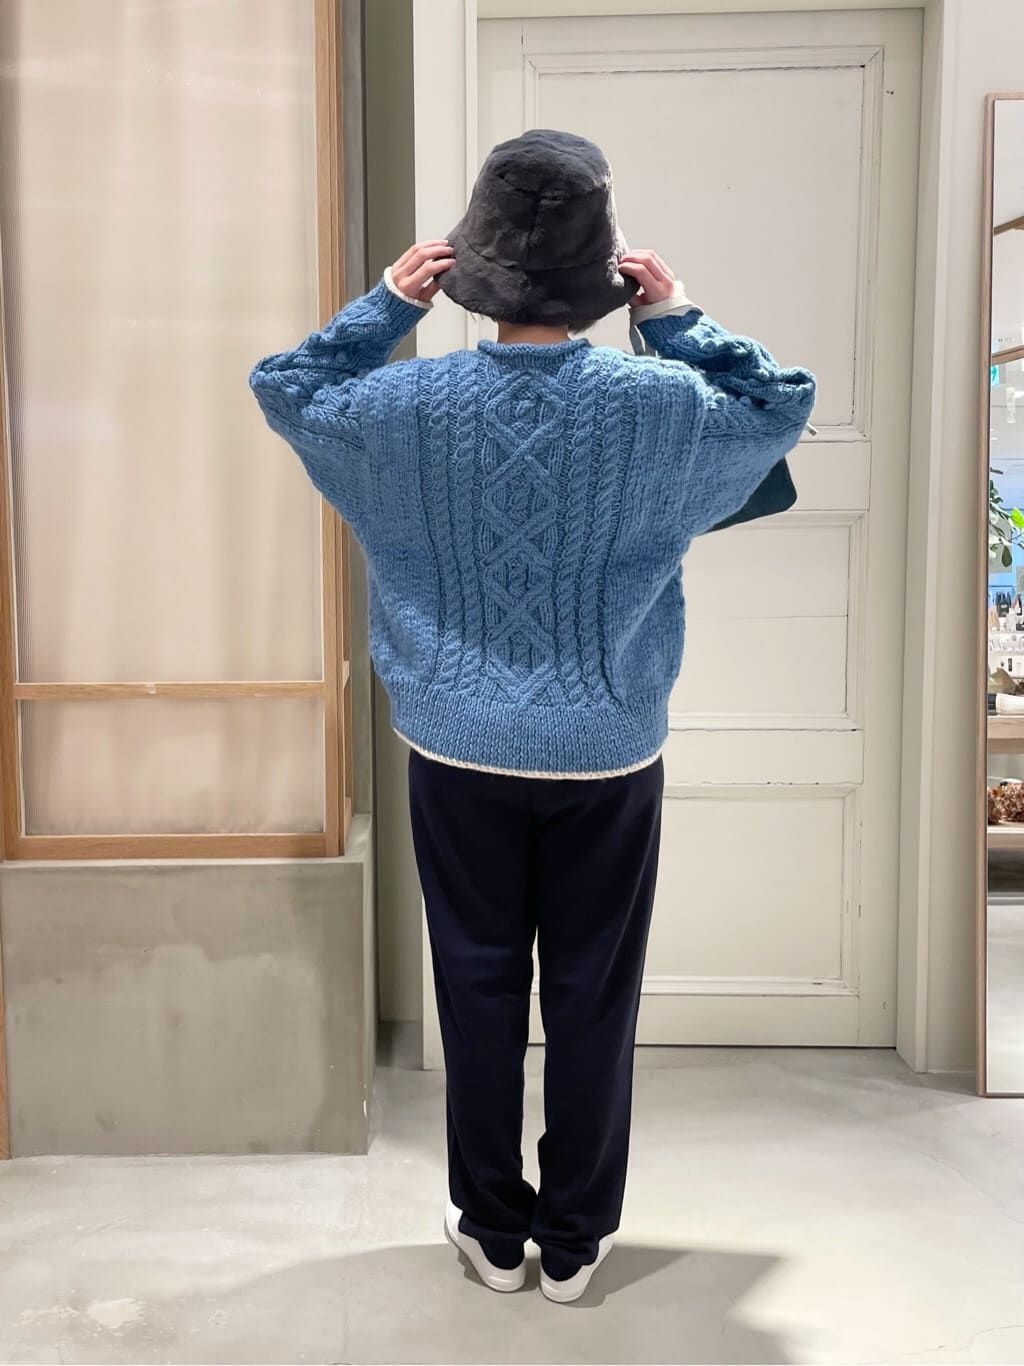 bulle de savon 渋谷スクランブルスクエア 身長:154cm 2021.09.15